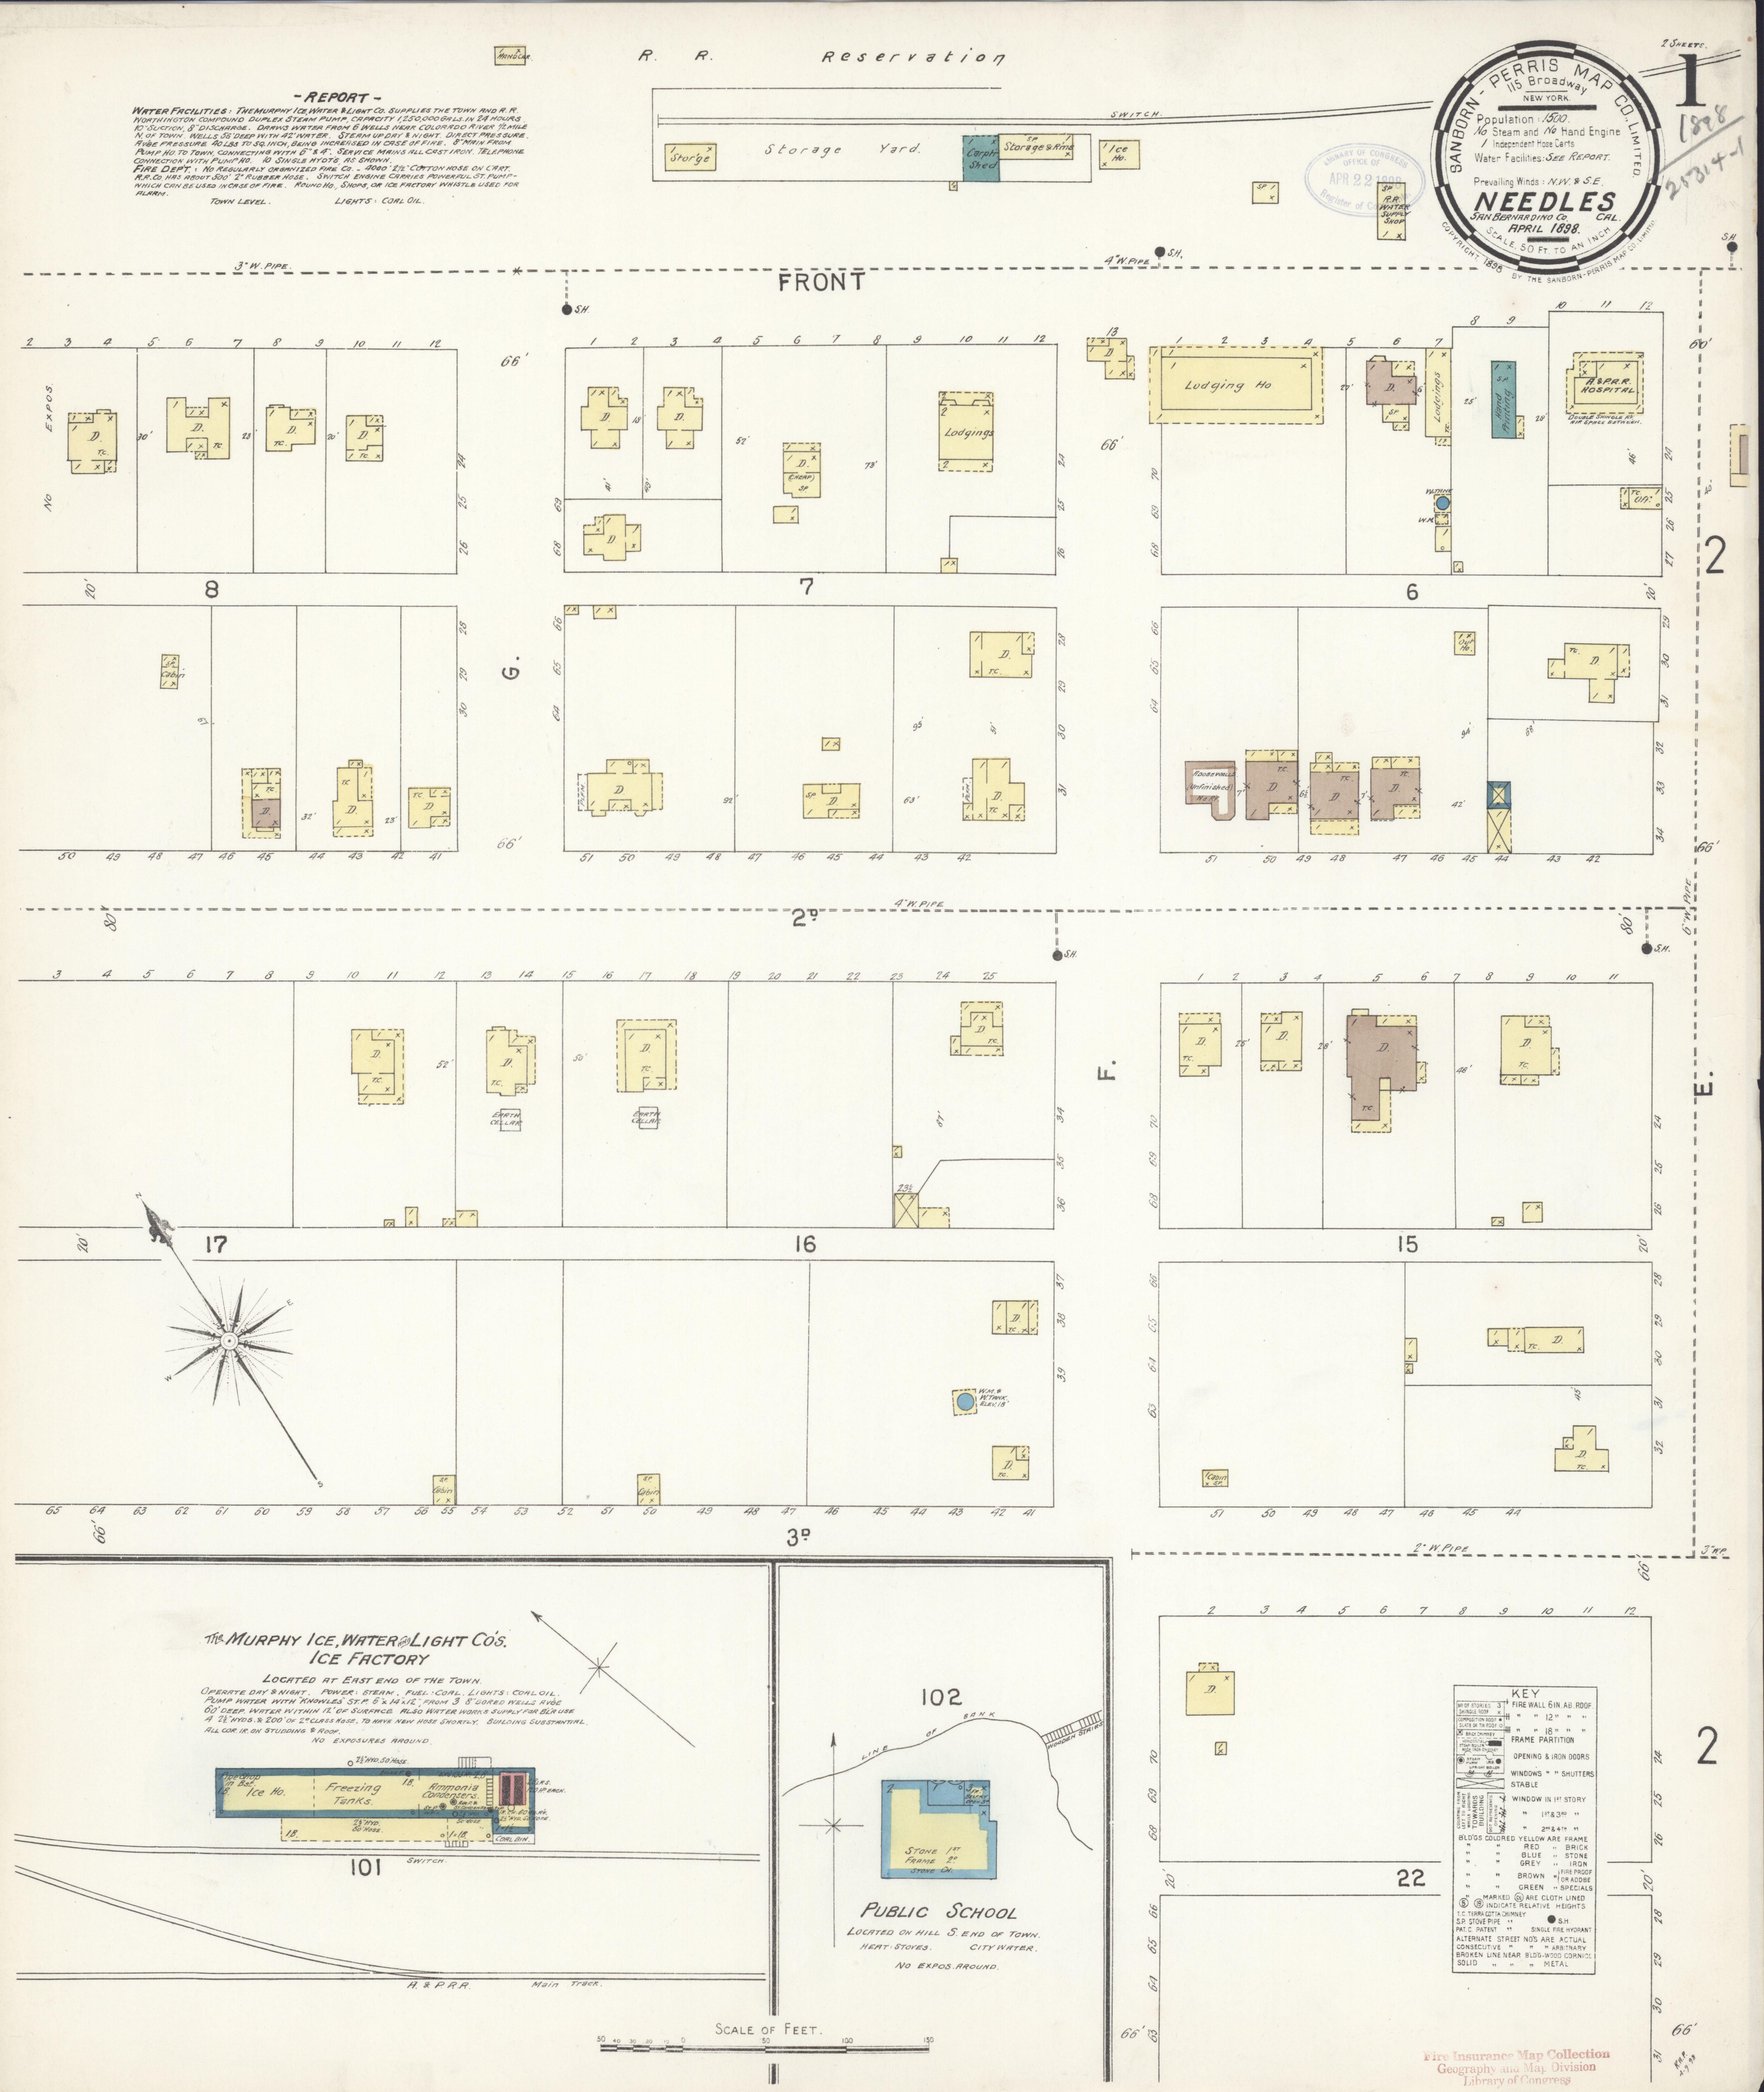 File Sanborn Fire Insurance Map From Needles San Bernardino County